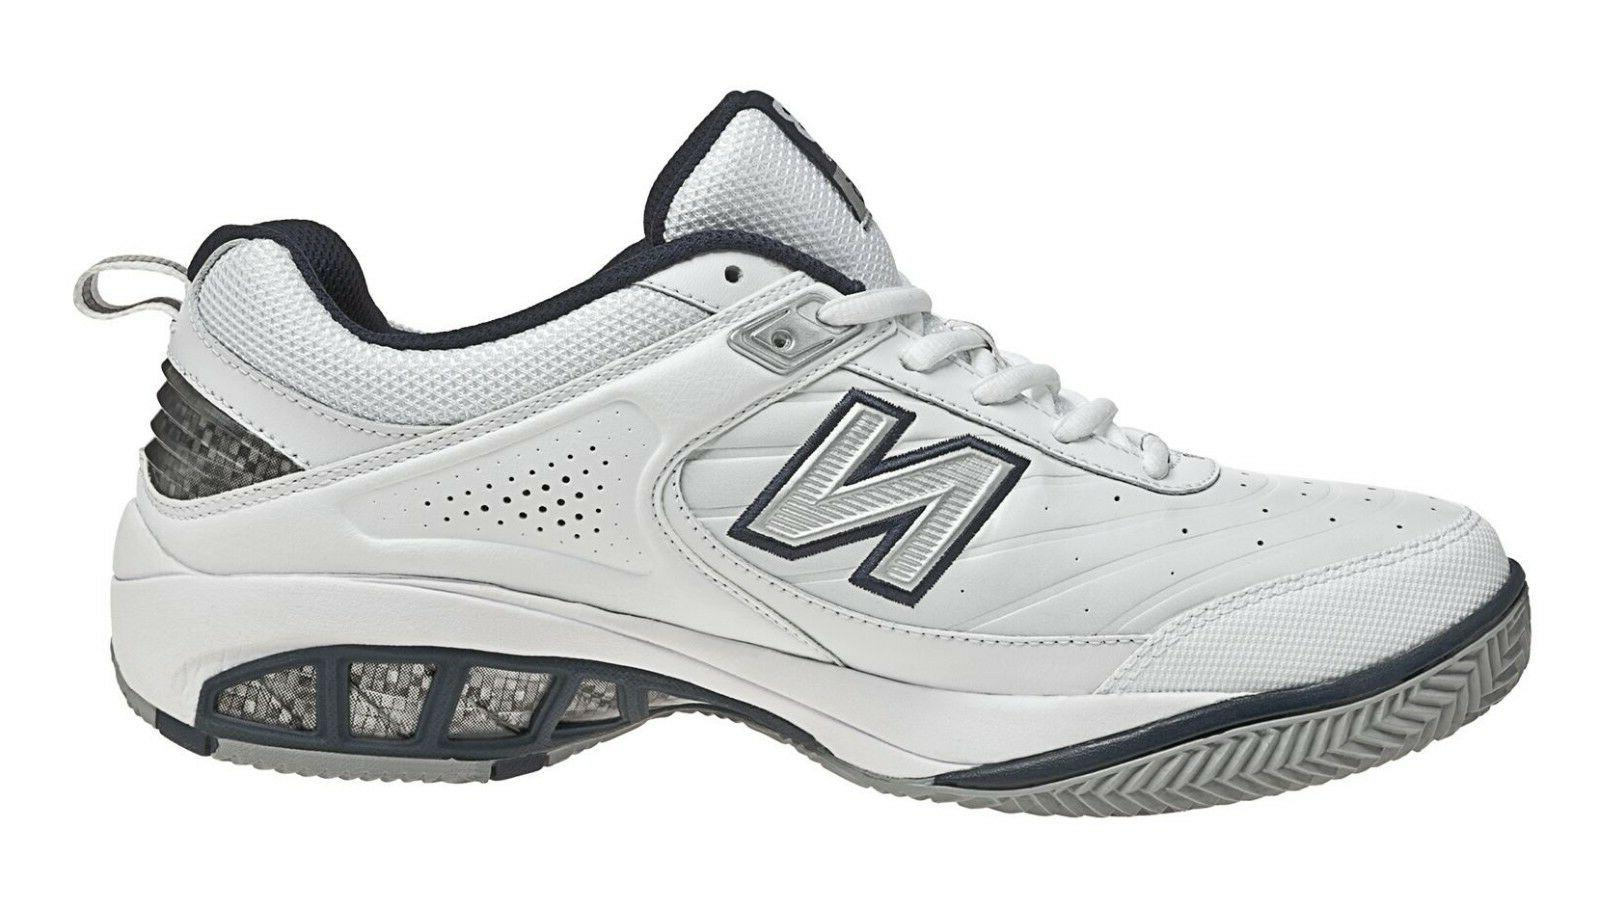 New Core Tennis Shoes